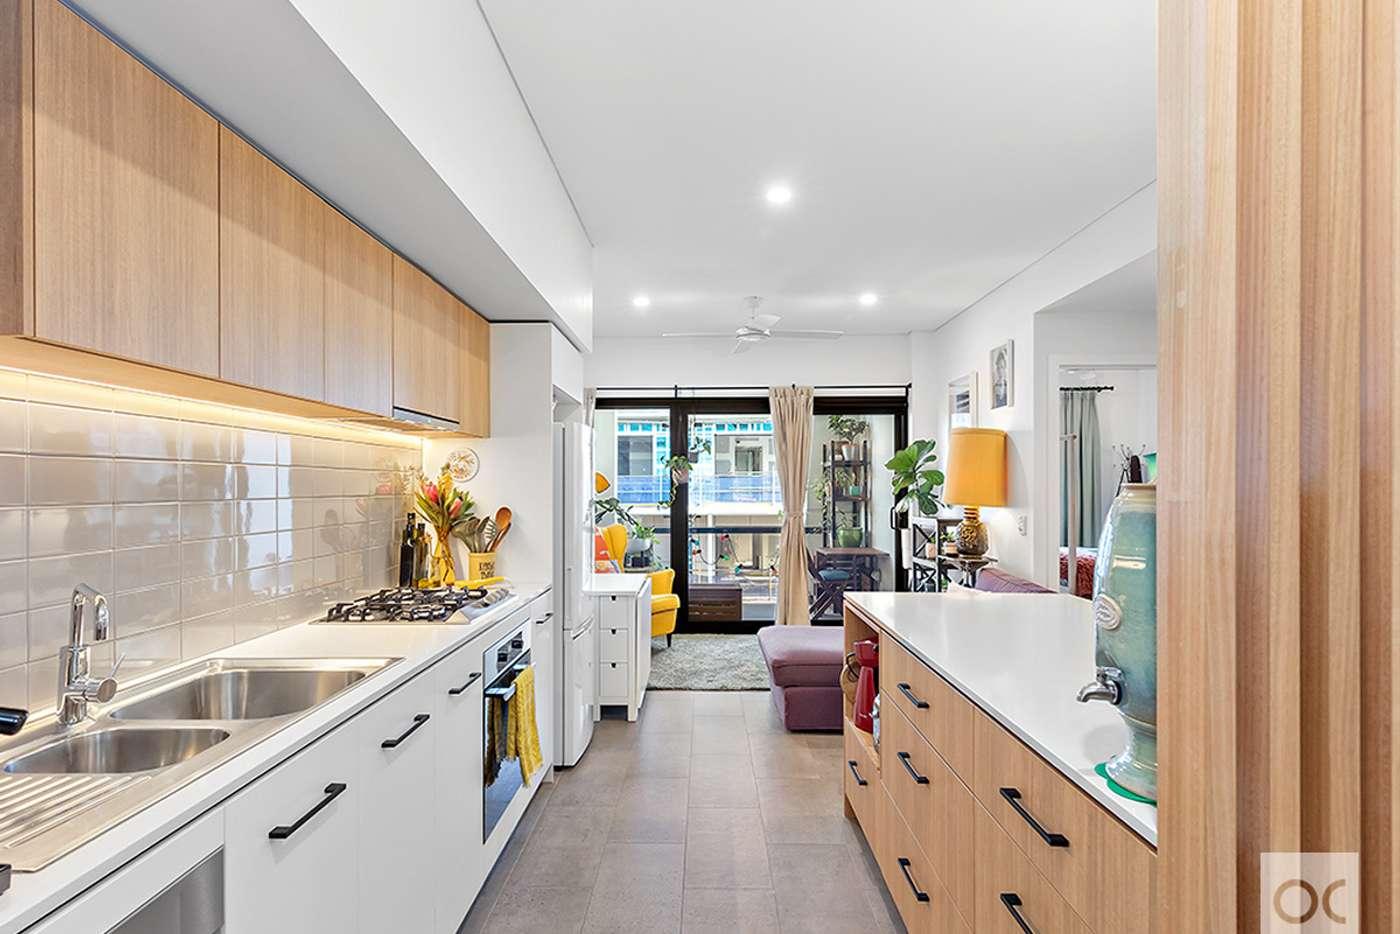 Main view of Homely apartment listing, 307/1 Kevin Taylor Lane, Bowden SA 5007